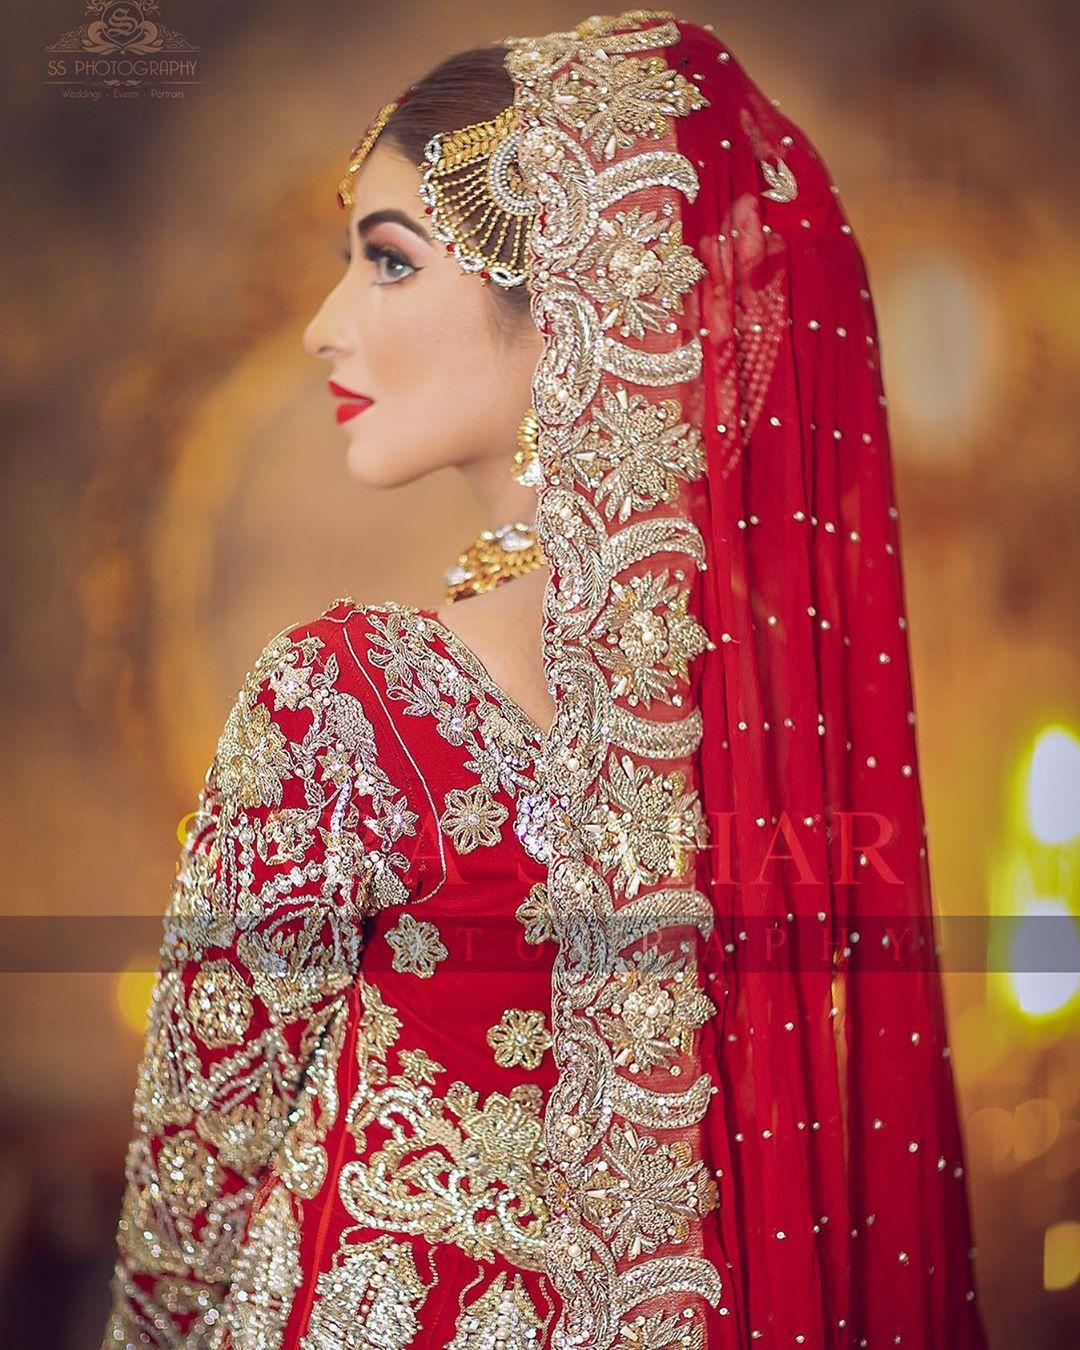 Pakistani Wedding Photography Poses Ideas 2020 for Couples ...   1350x1080